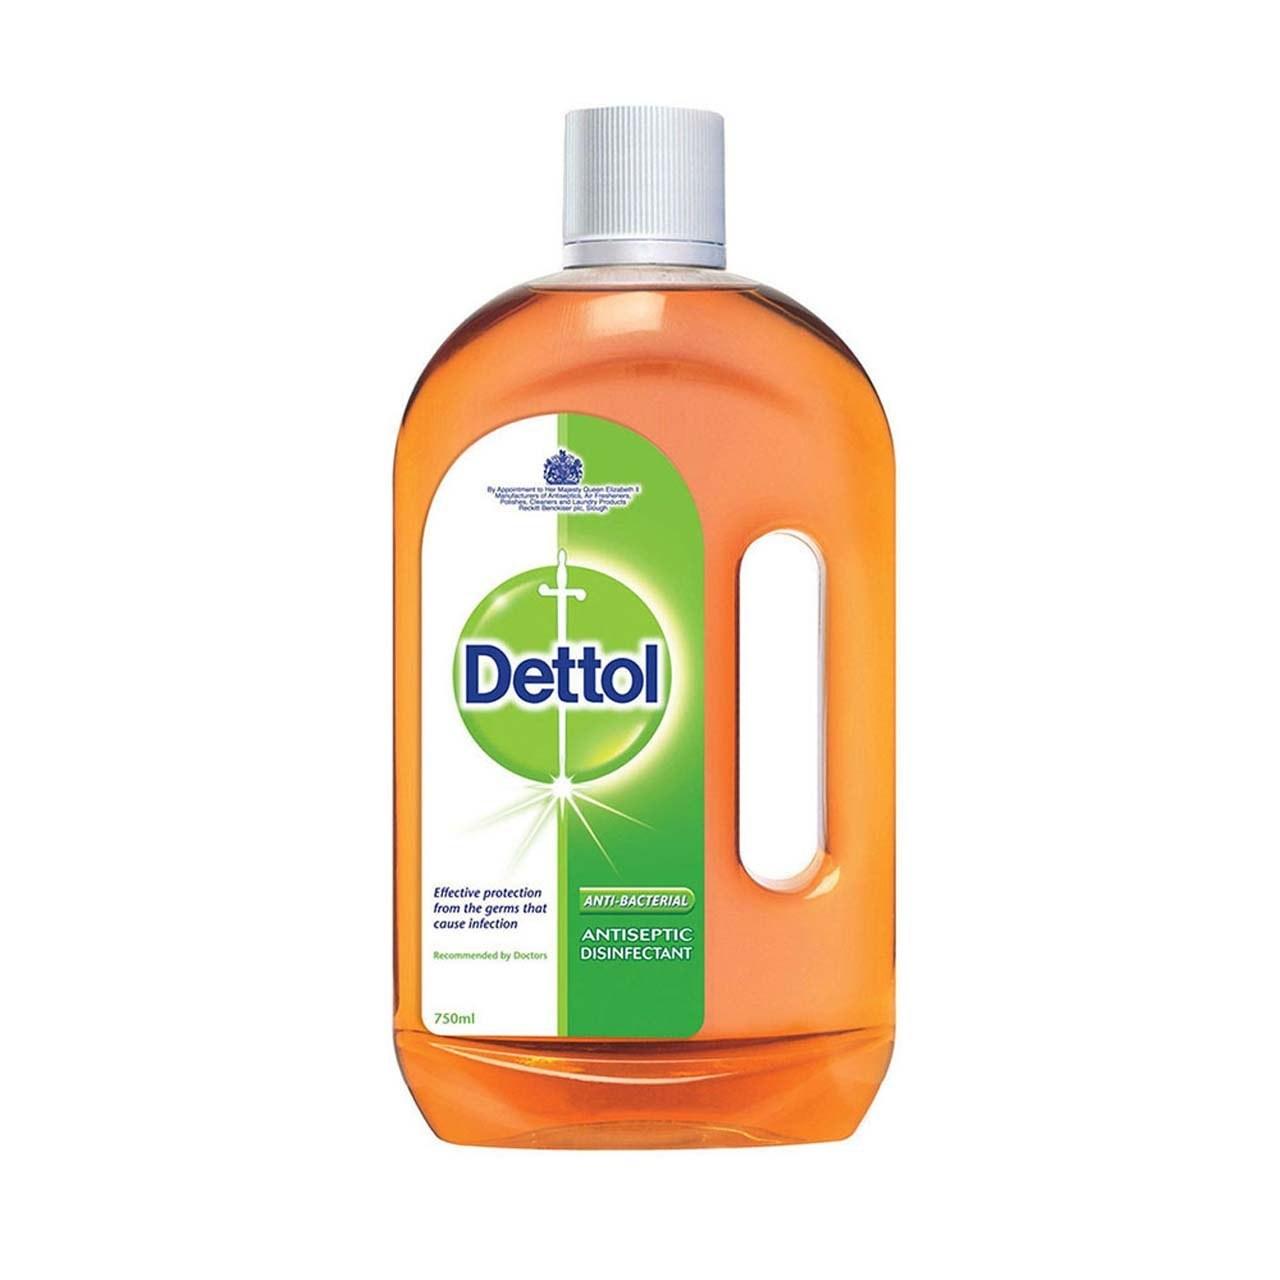 مایع ضدعفونی کننده 750 میلی لیتری دتول Dettol |